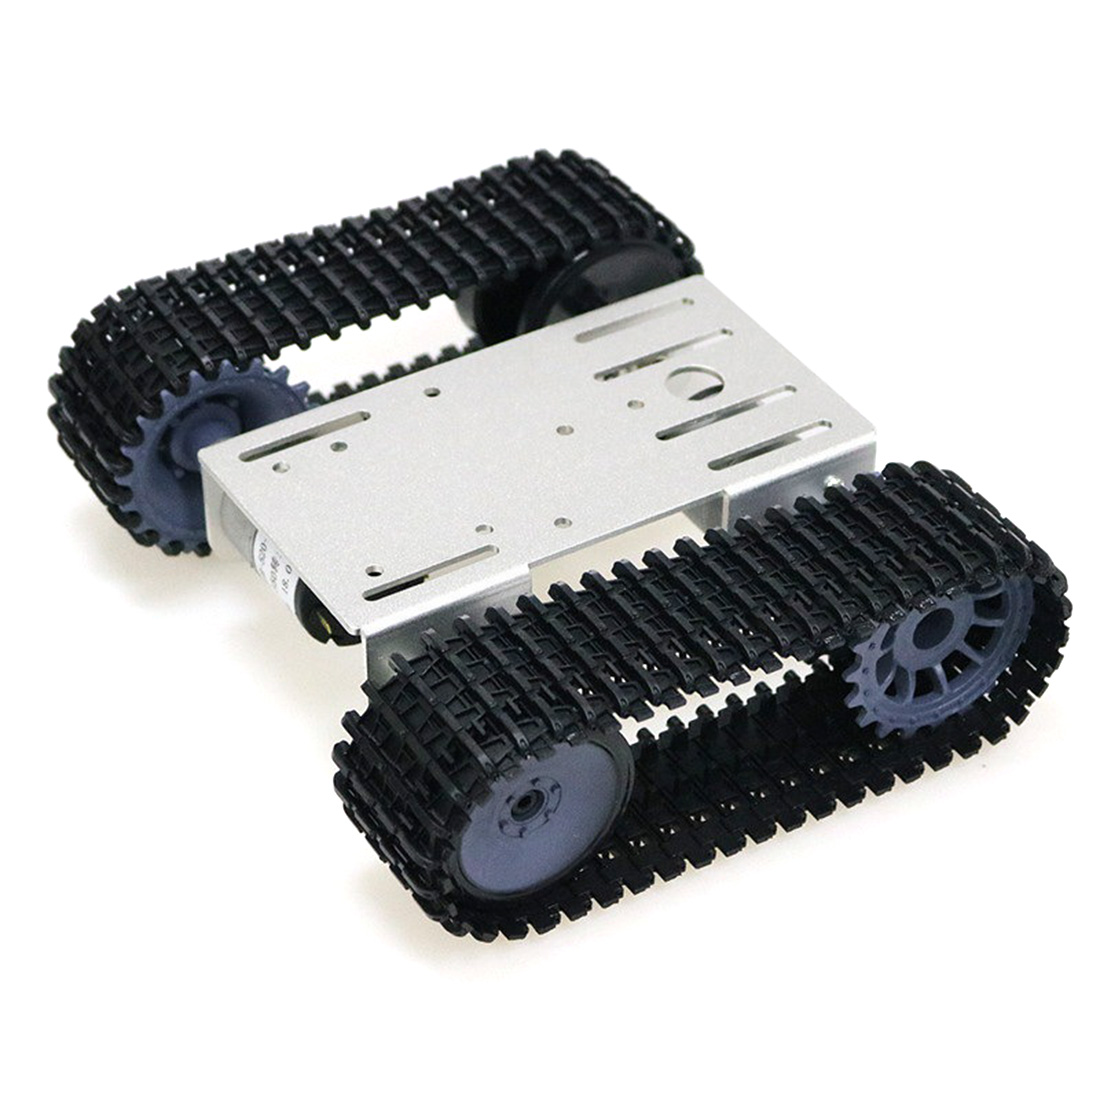 TP101 High Tech Tracked Robot Smart Car Platform DIY Metal Robot Tank Crawler Chassis Platform Kit For Arduino - Silver